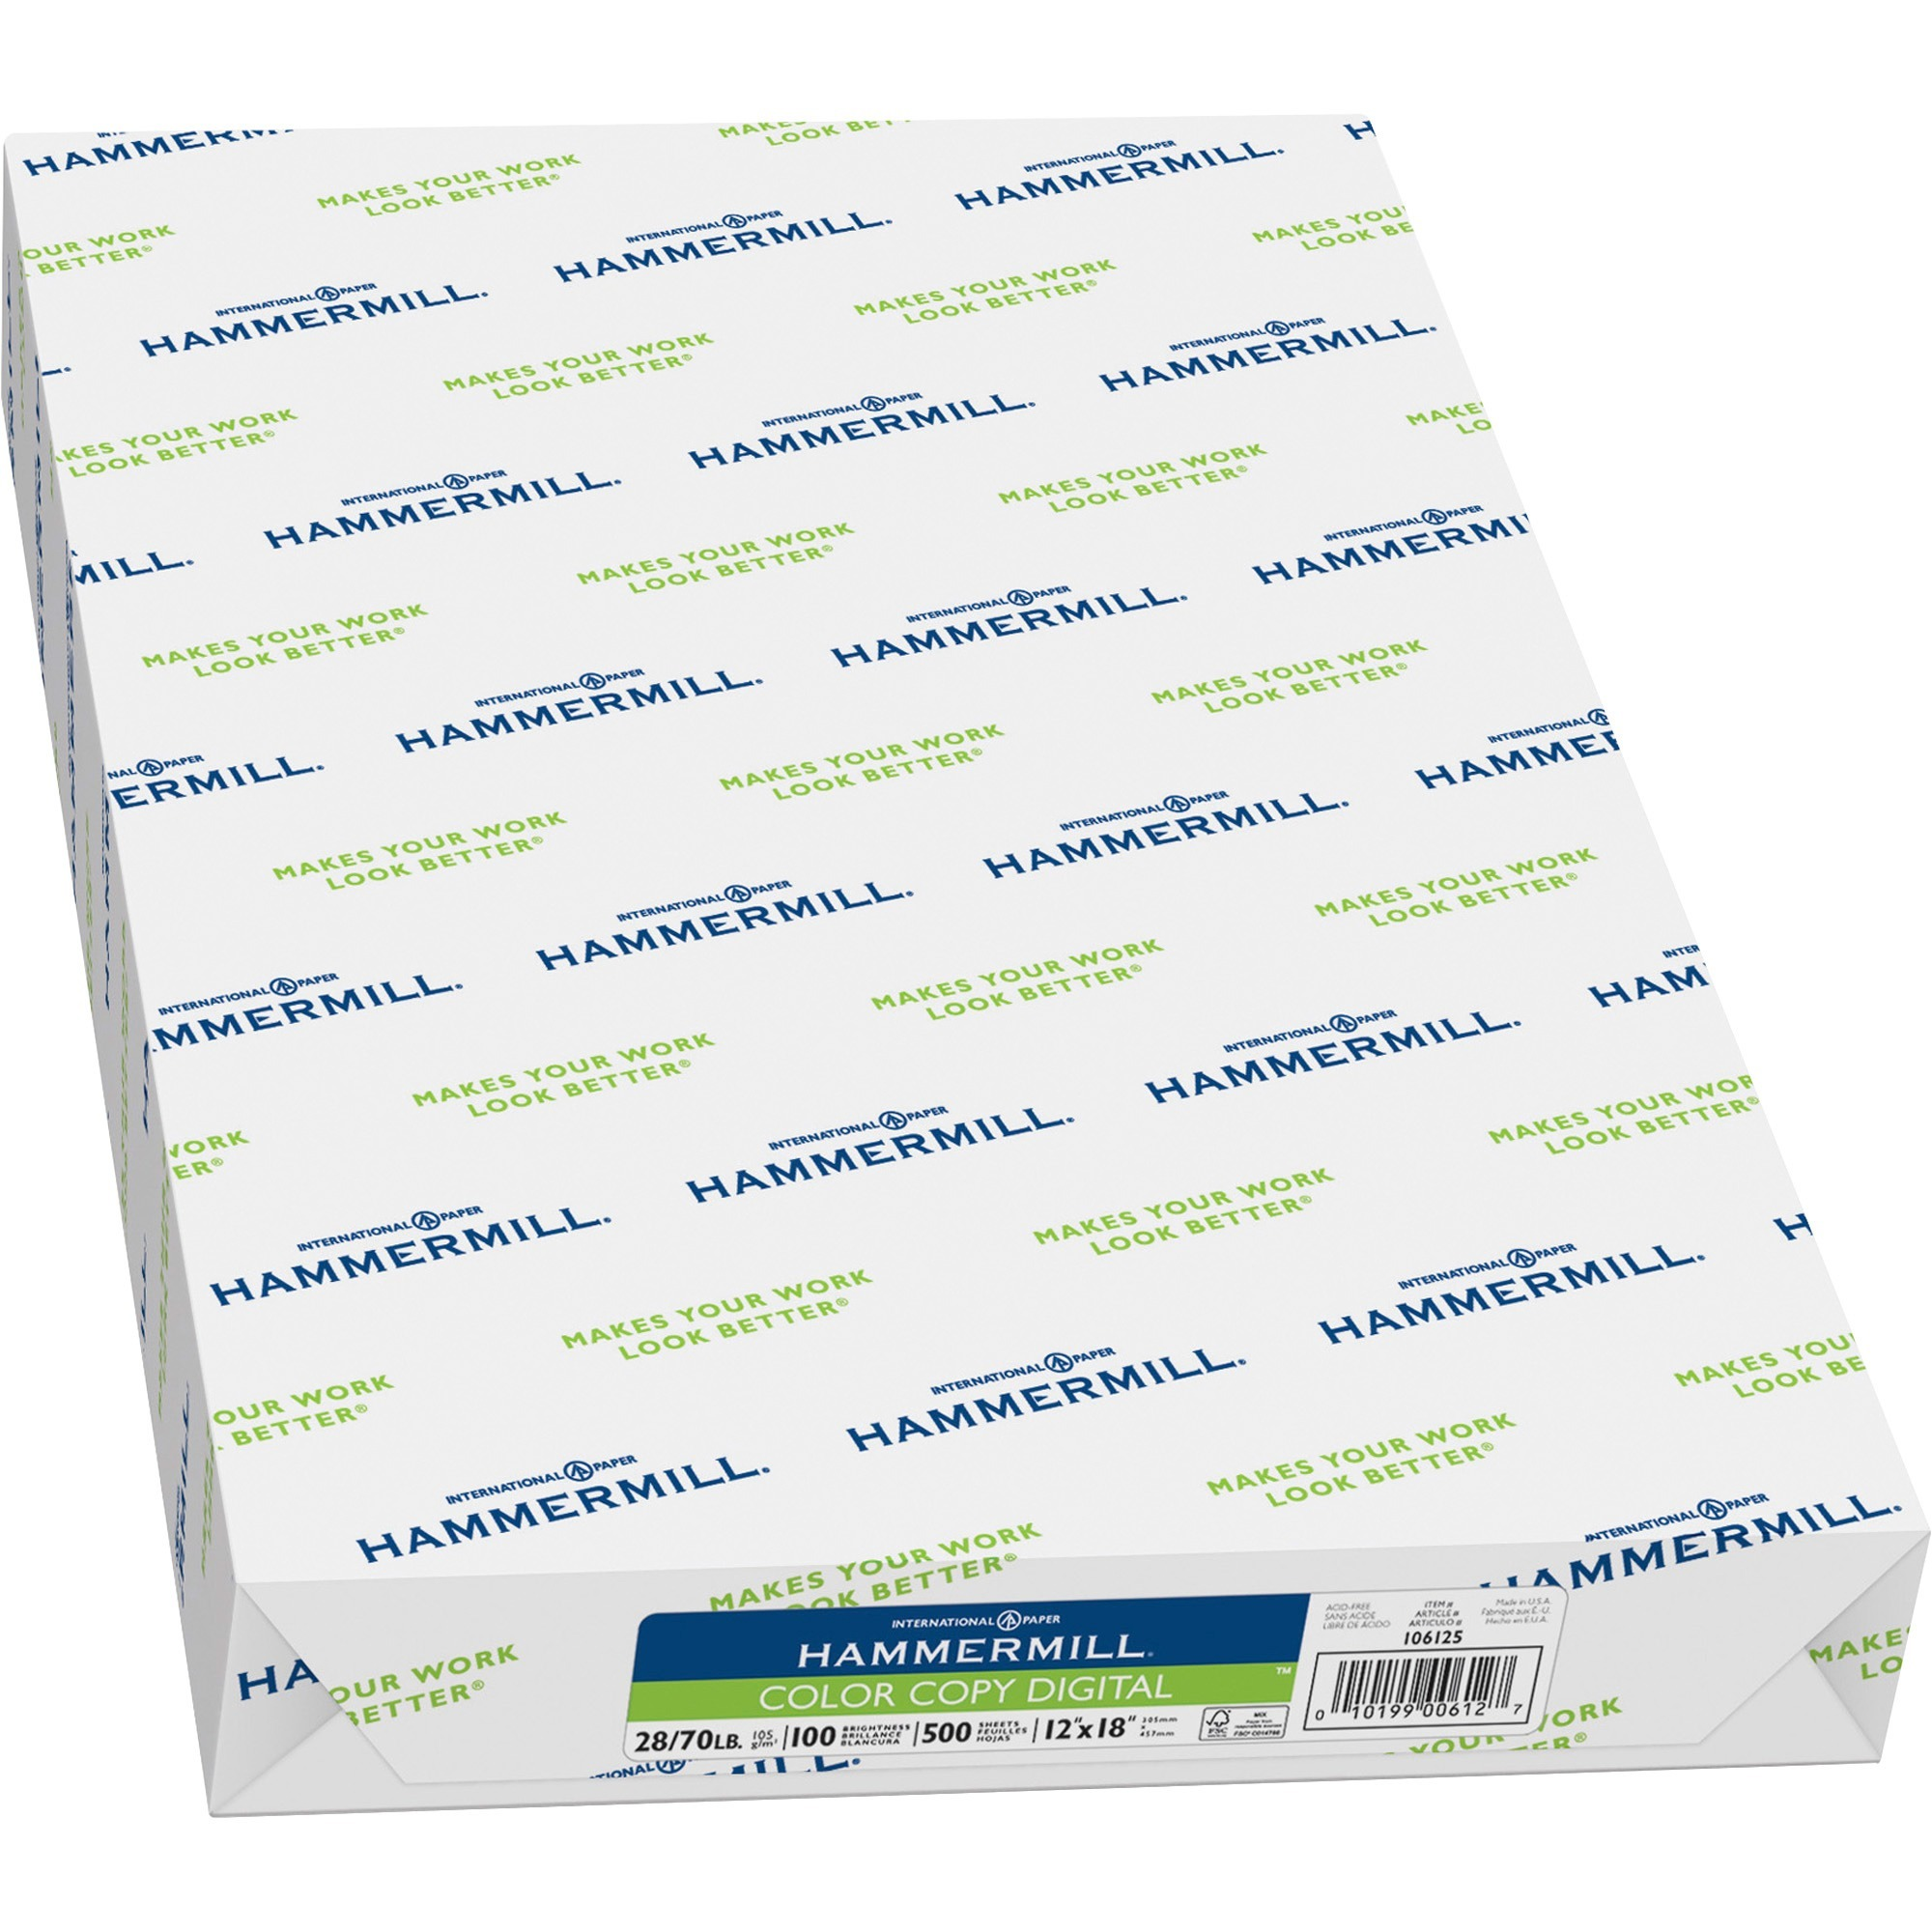 Hammermill, HAM106125, Photo White Surface Color Copy Paper, 500 / Ream, White